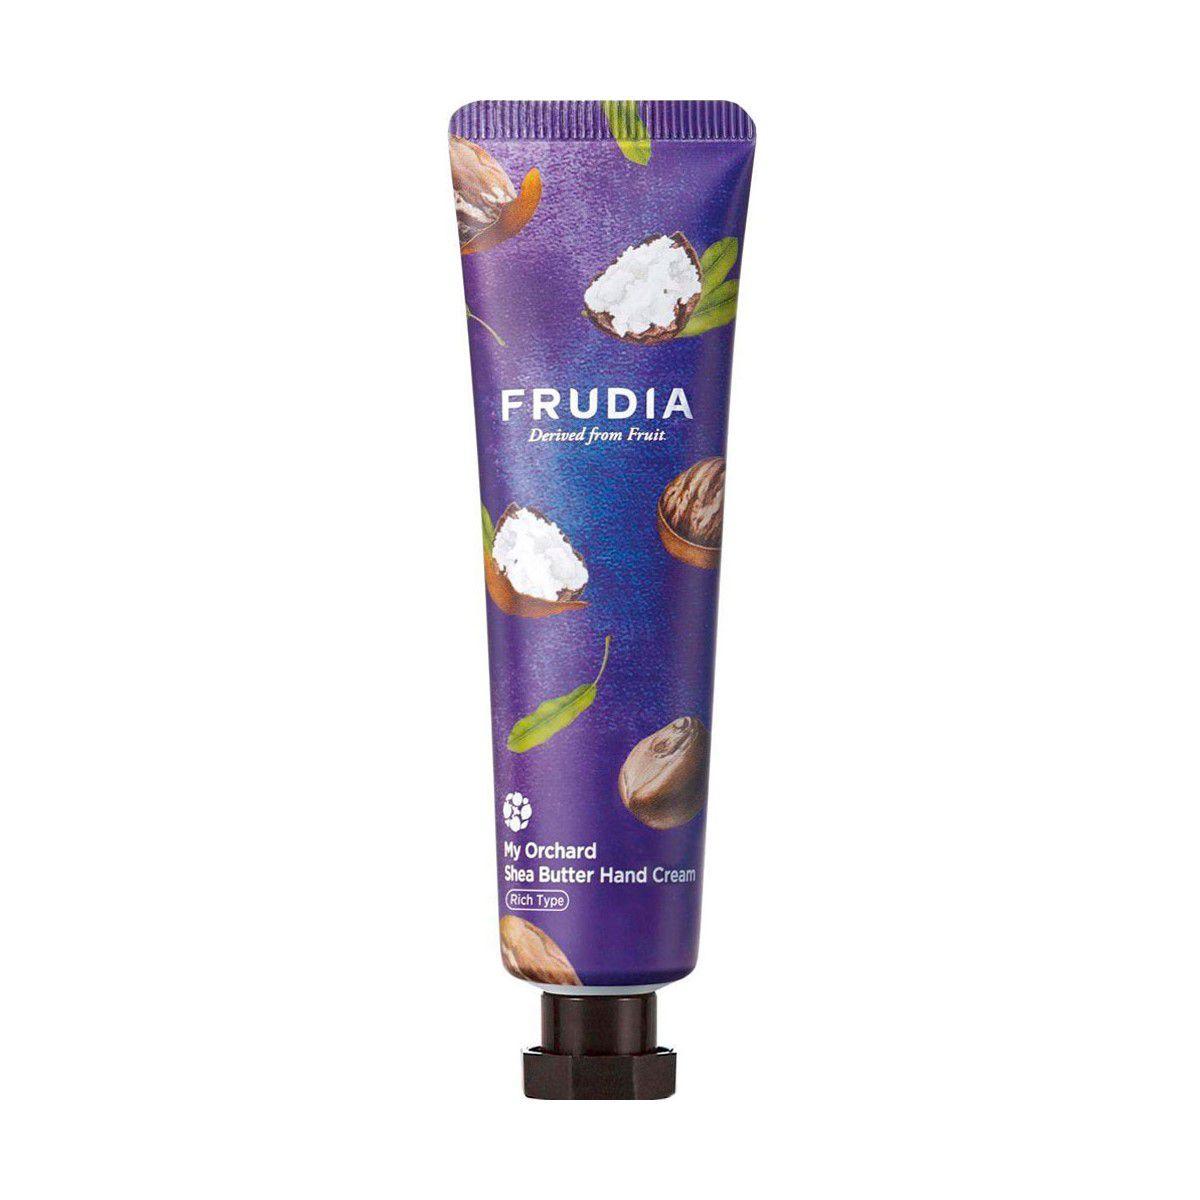 FRUDIA My Orchard Shea Butter Hand Creamのバリエーション13